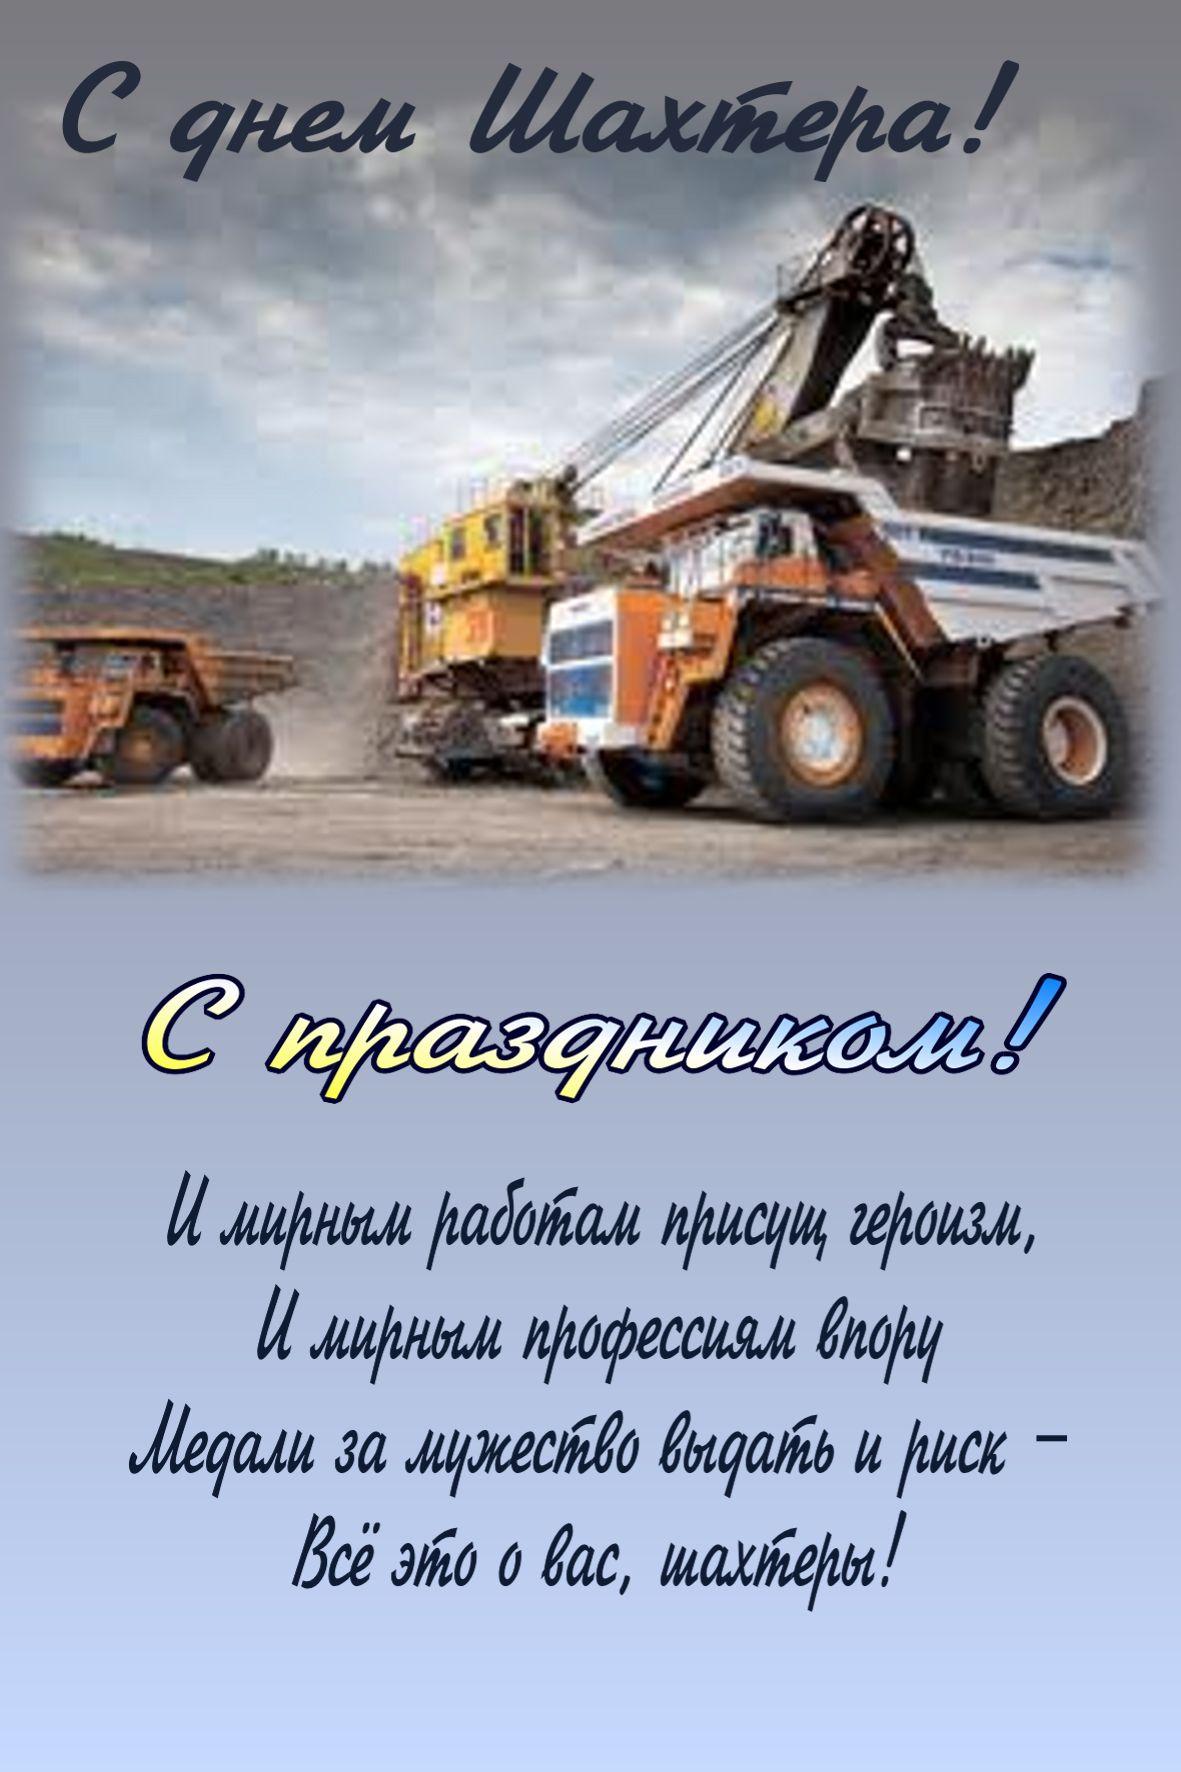 Картинки к празднику дню шахтера